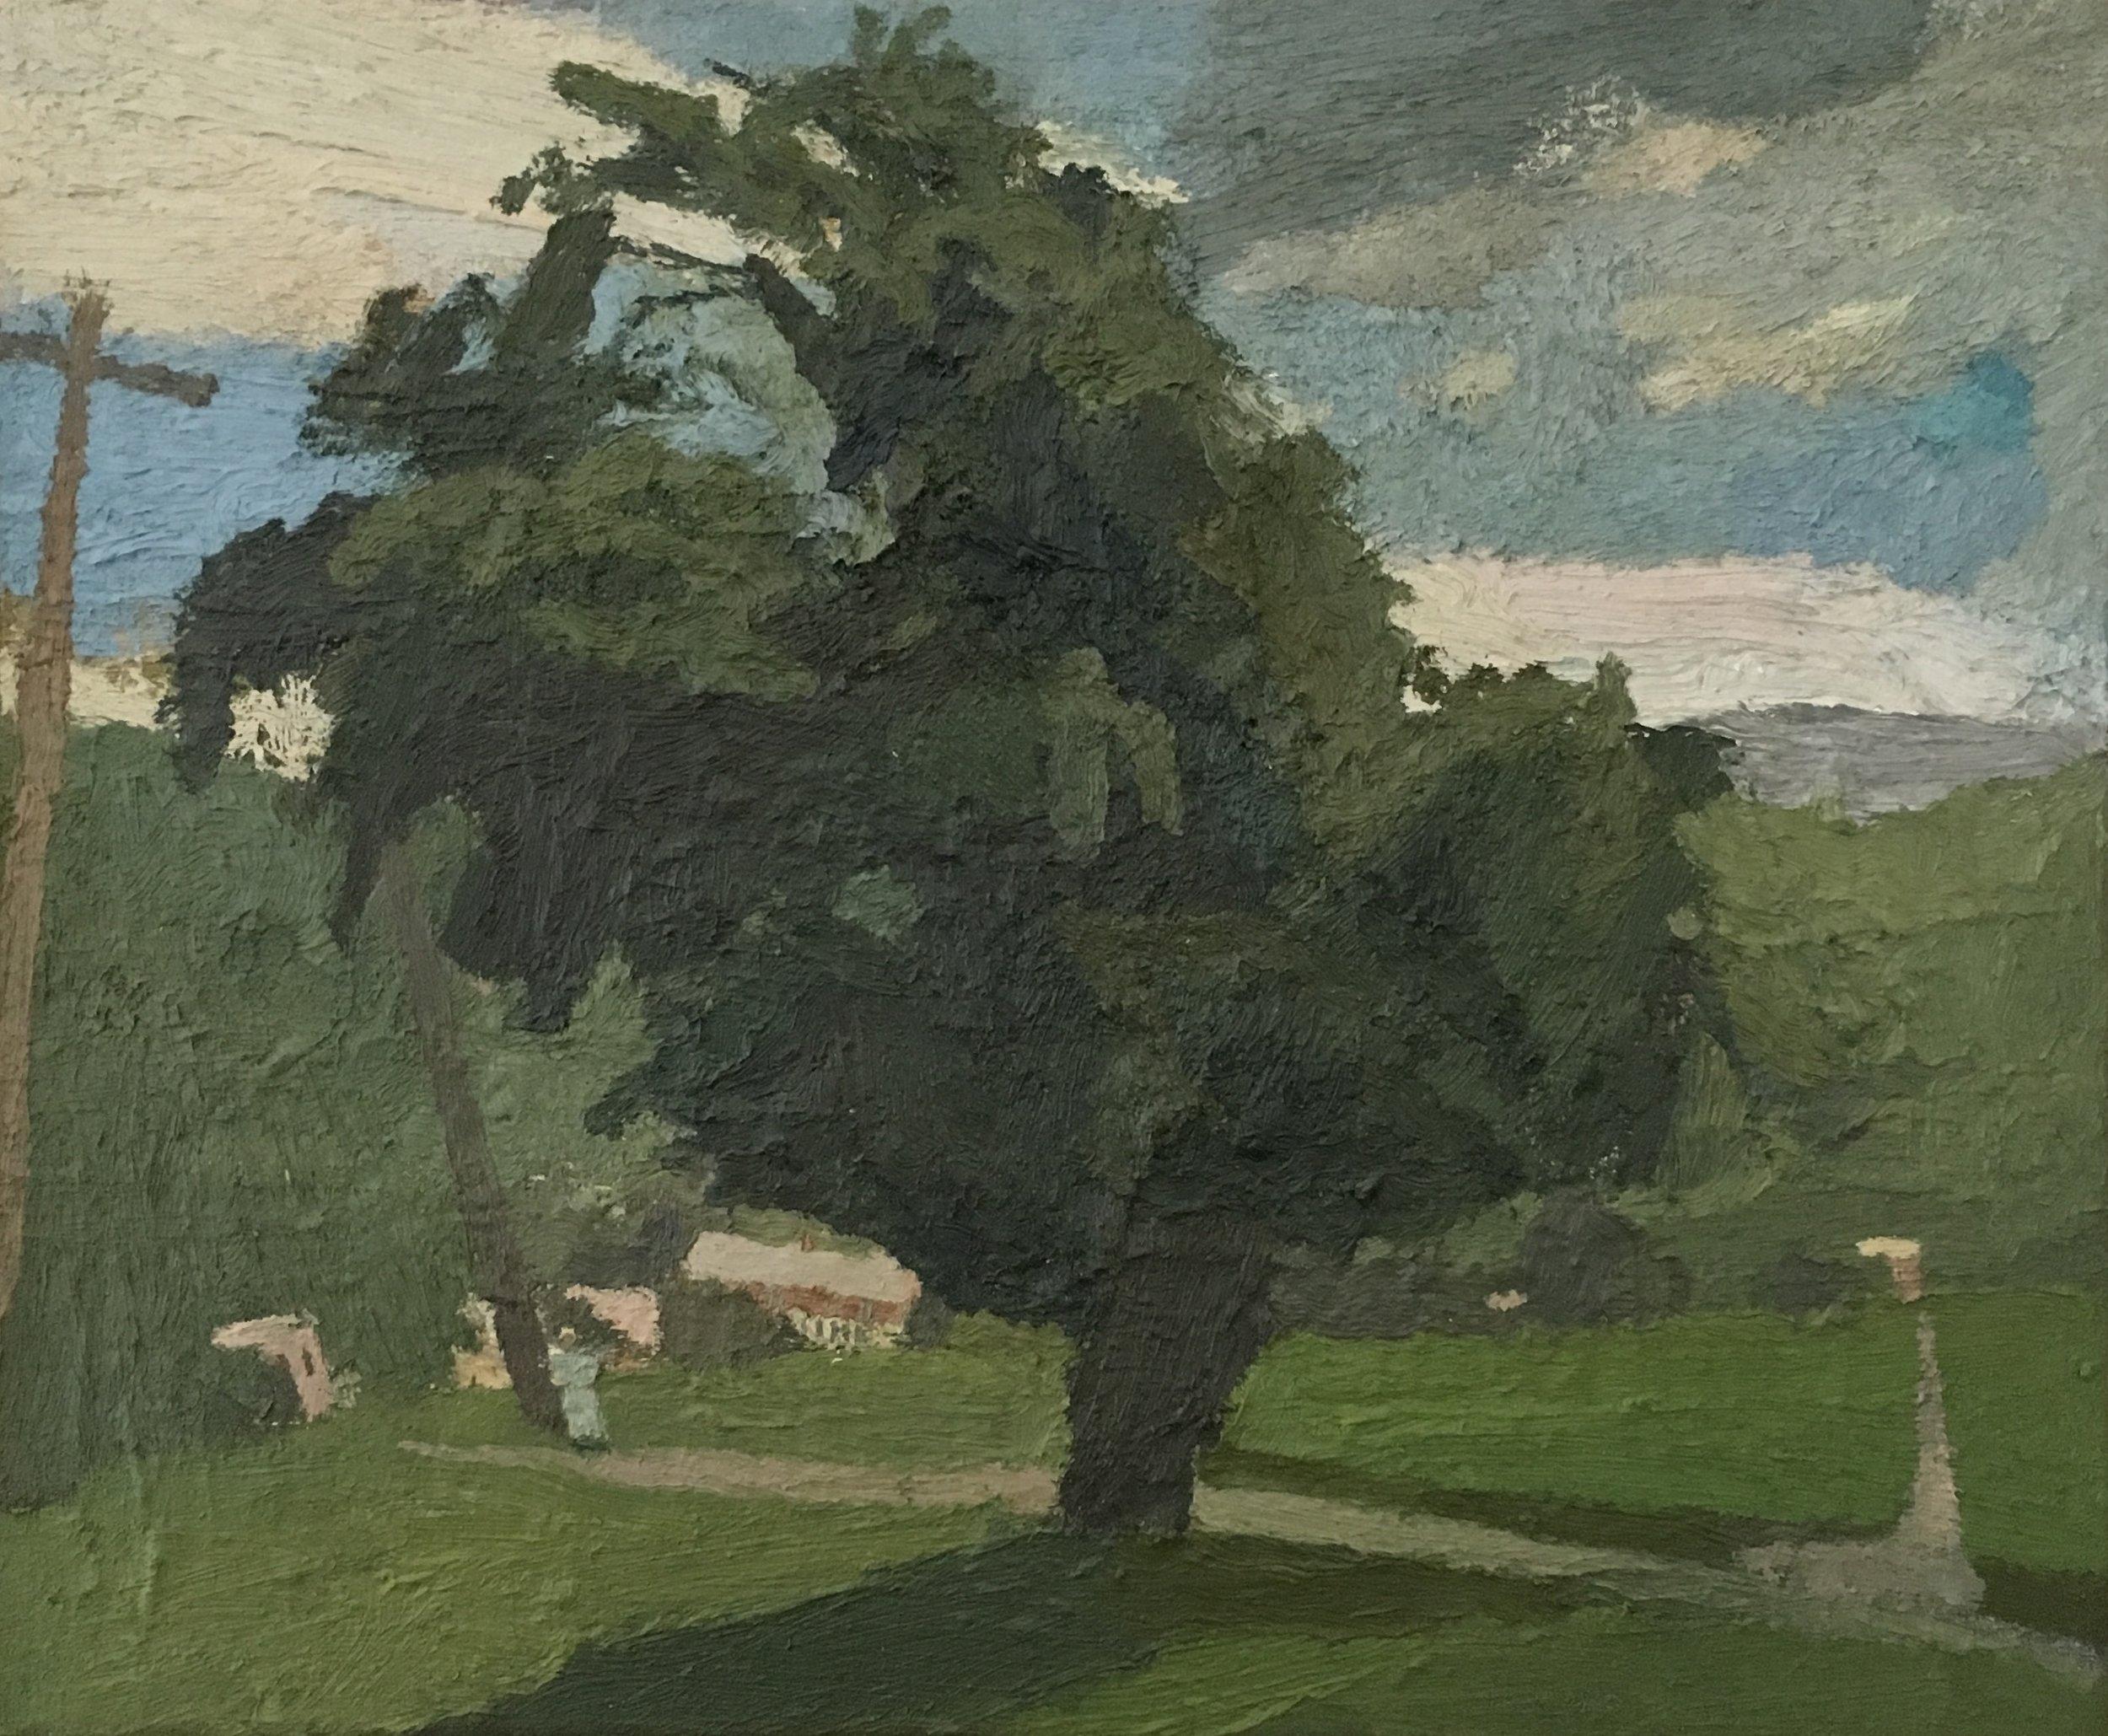 Tree by a Mennonite Church